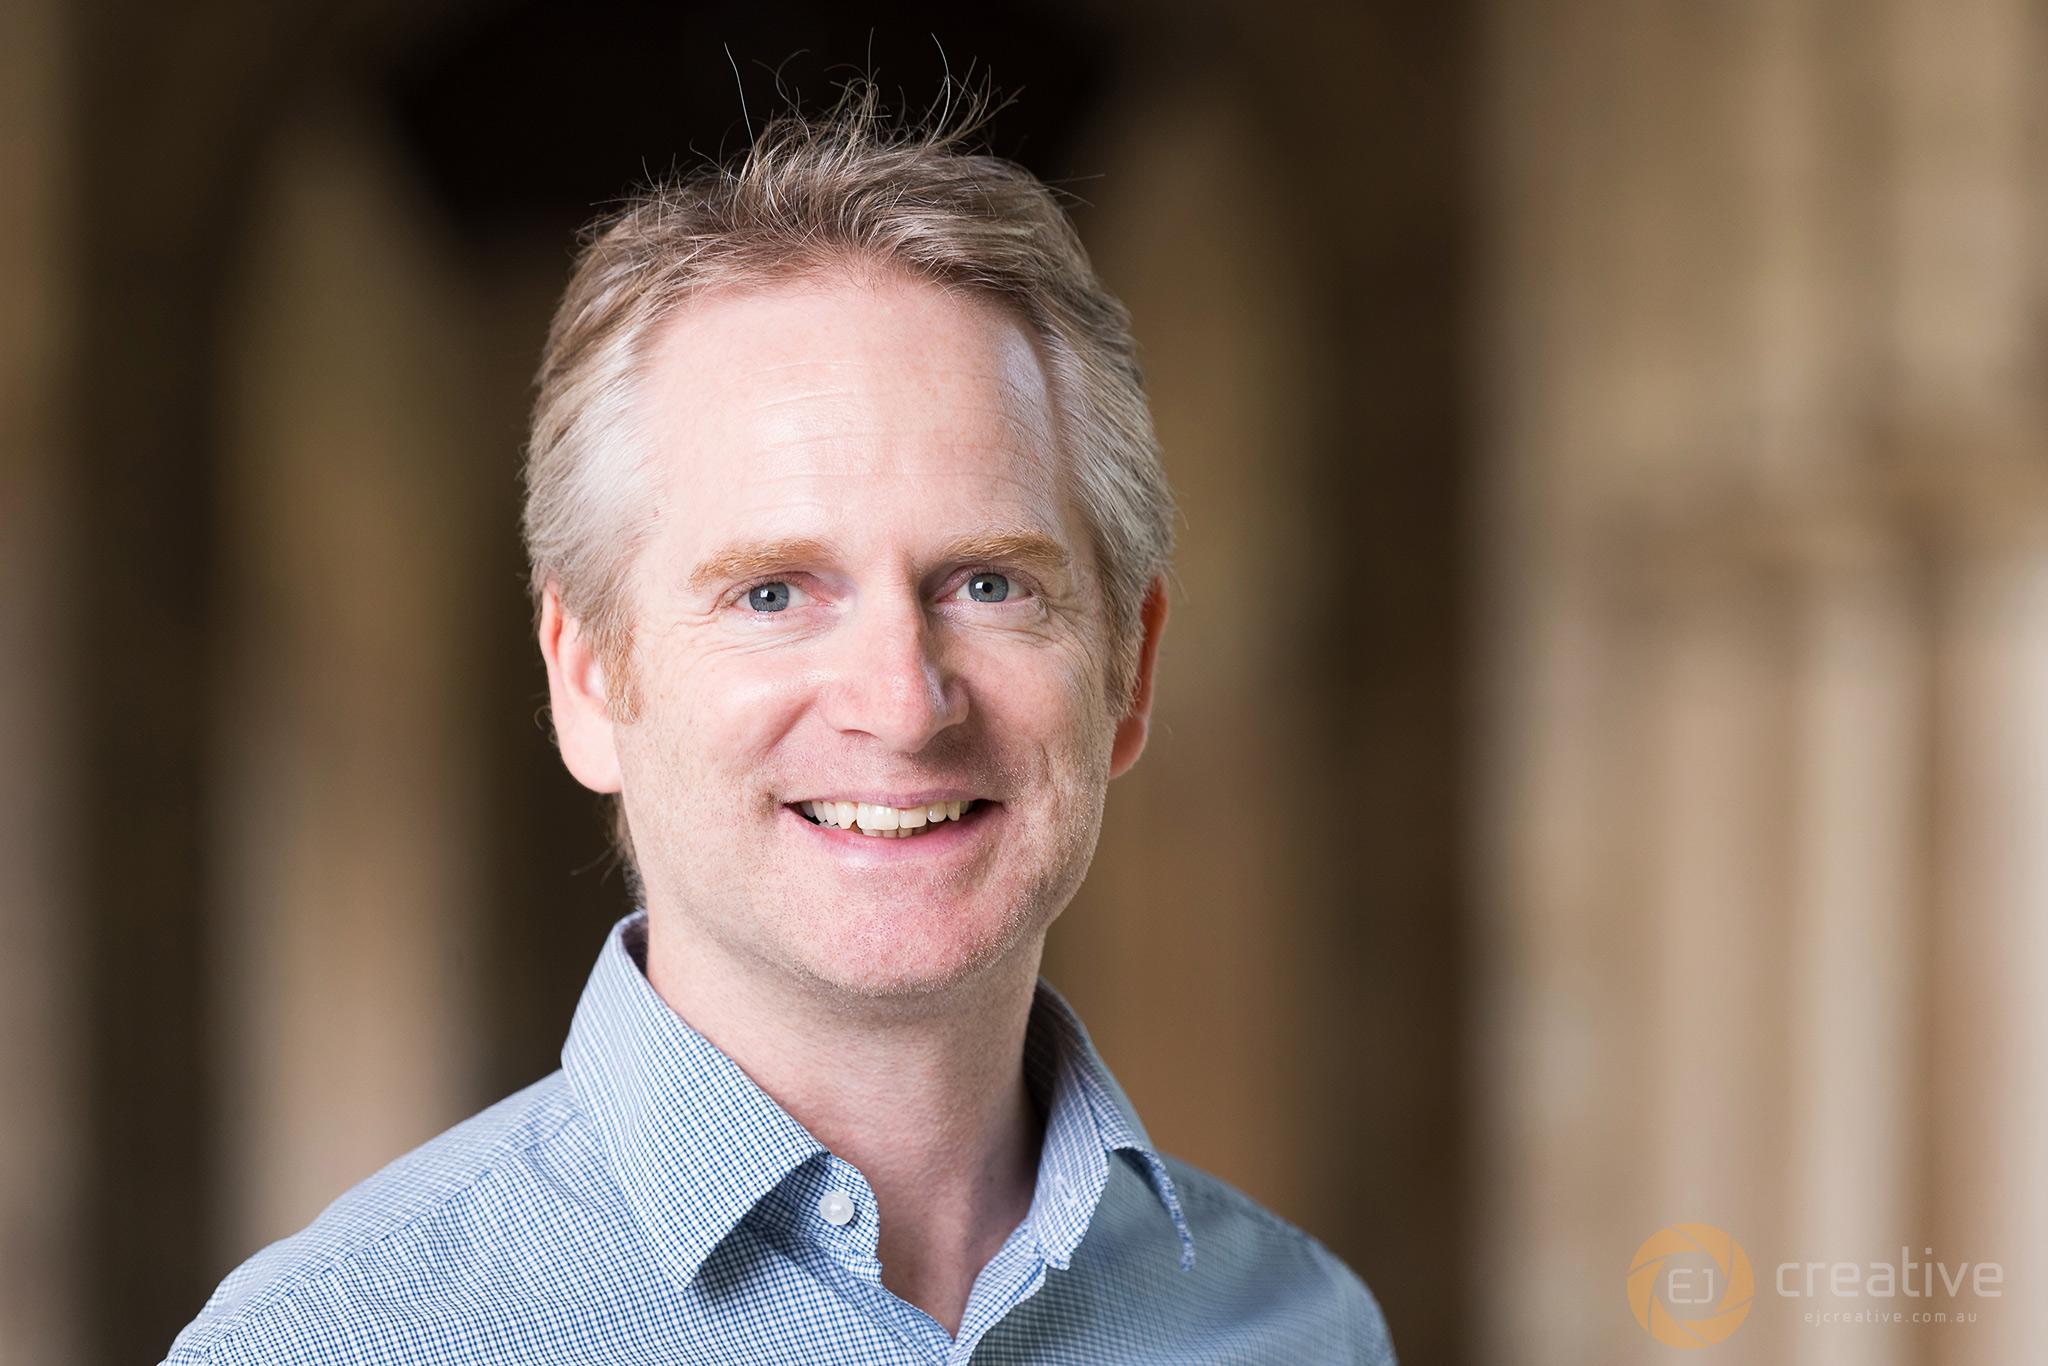 Prof Matt Kilburn